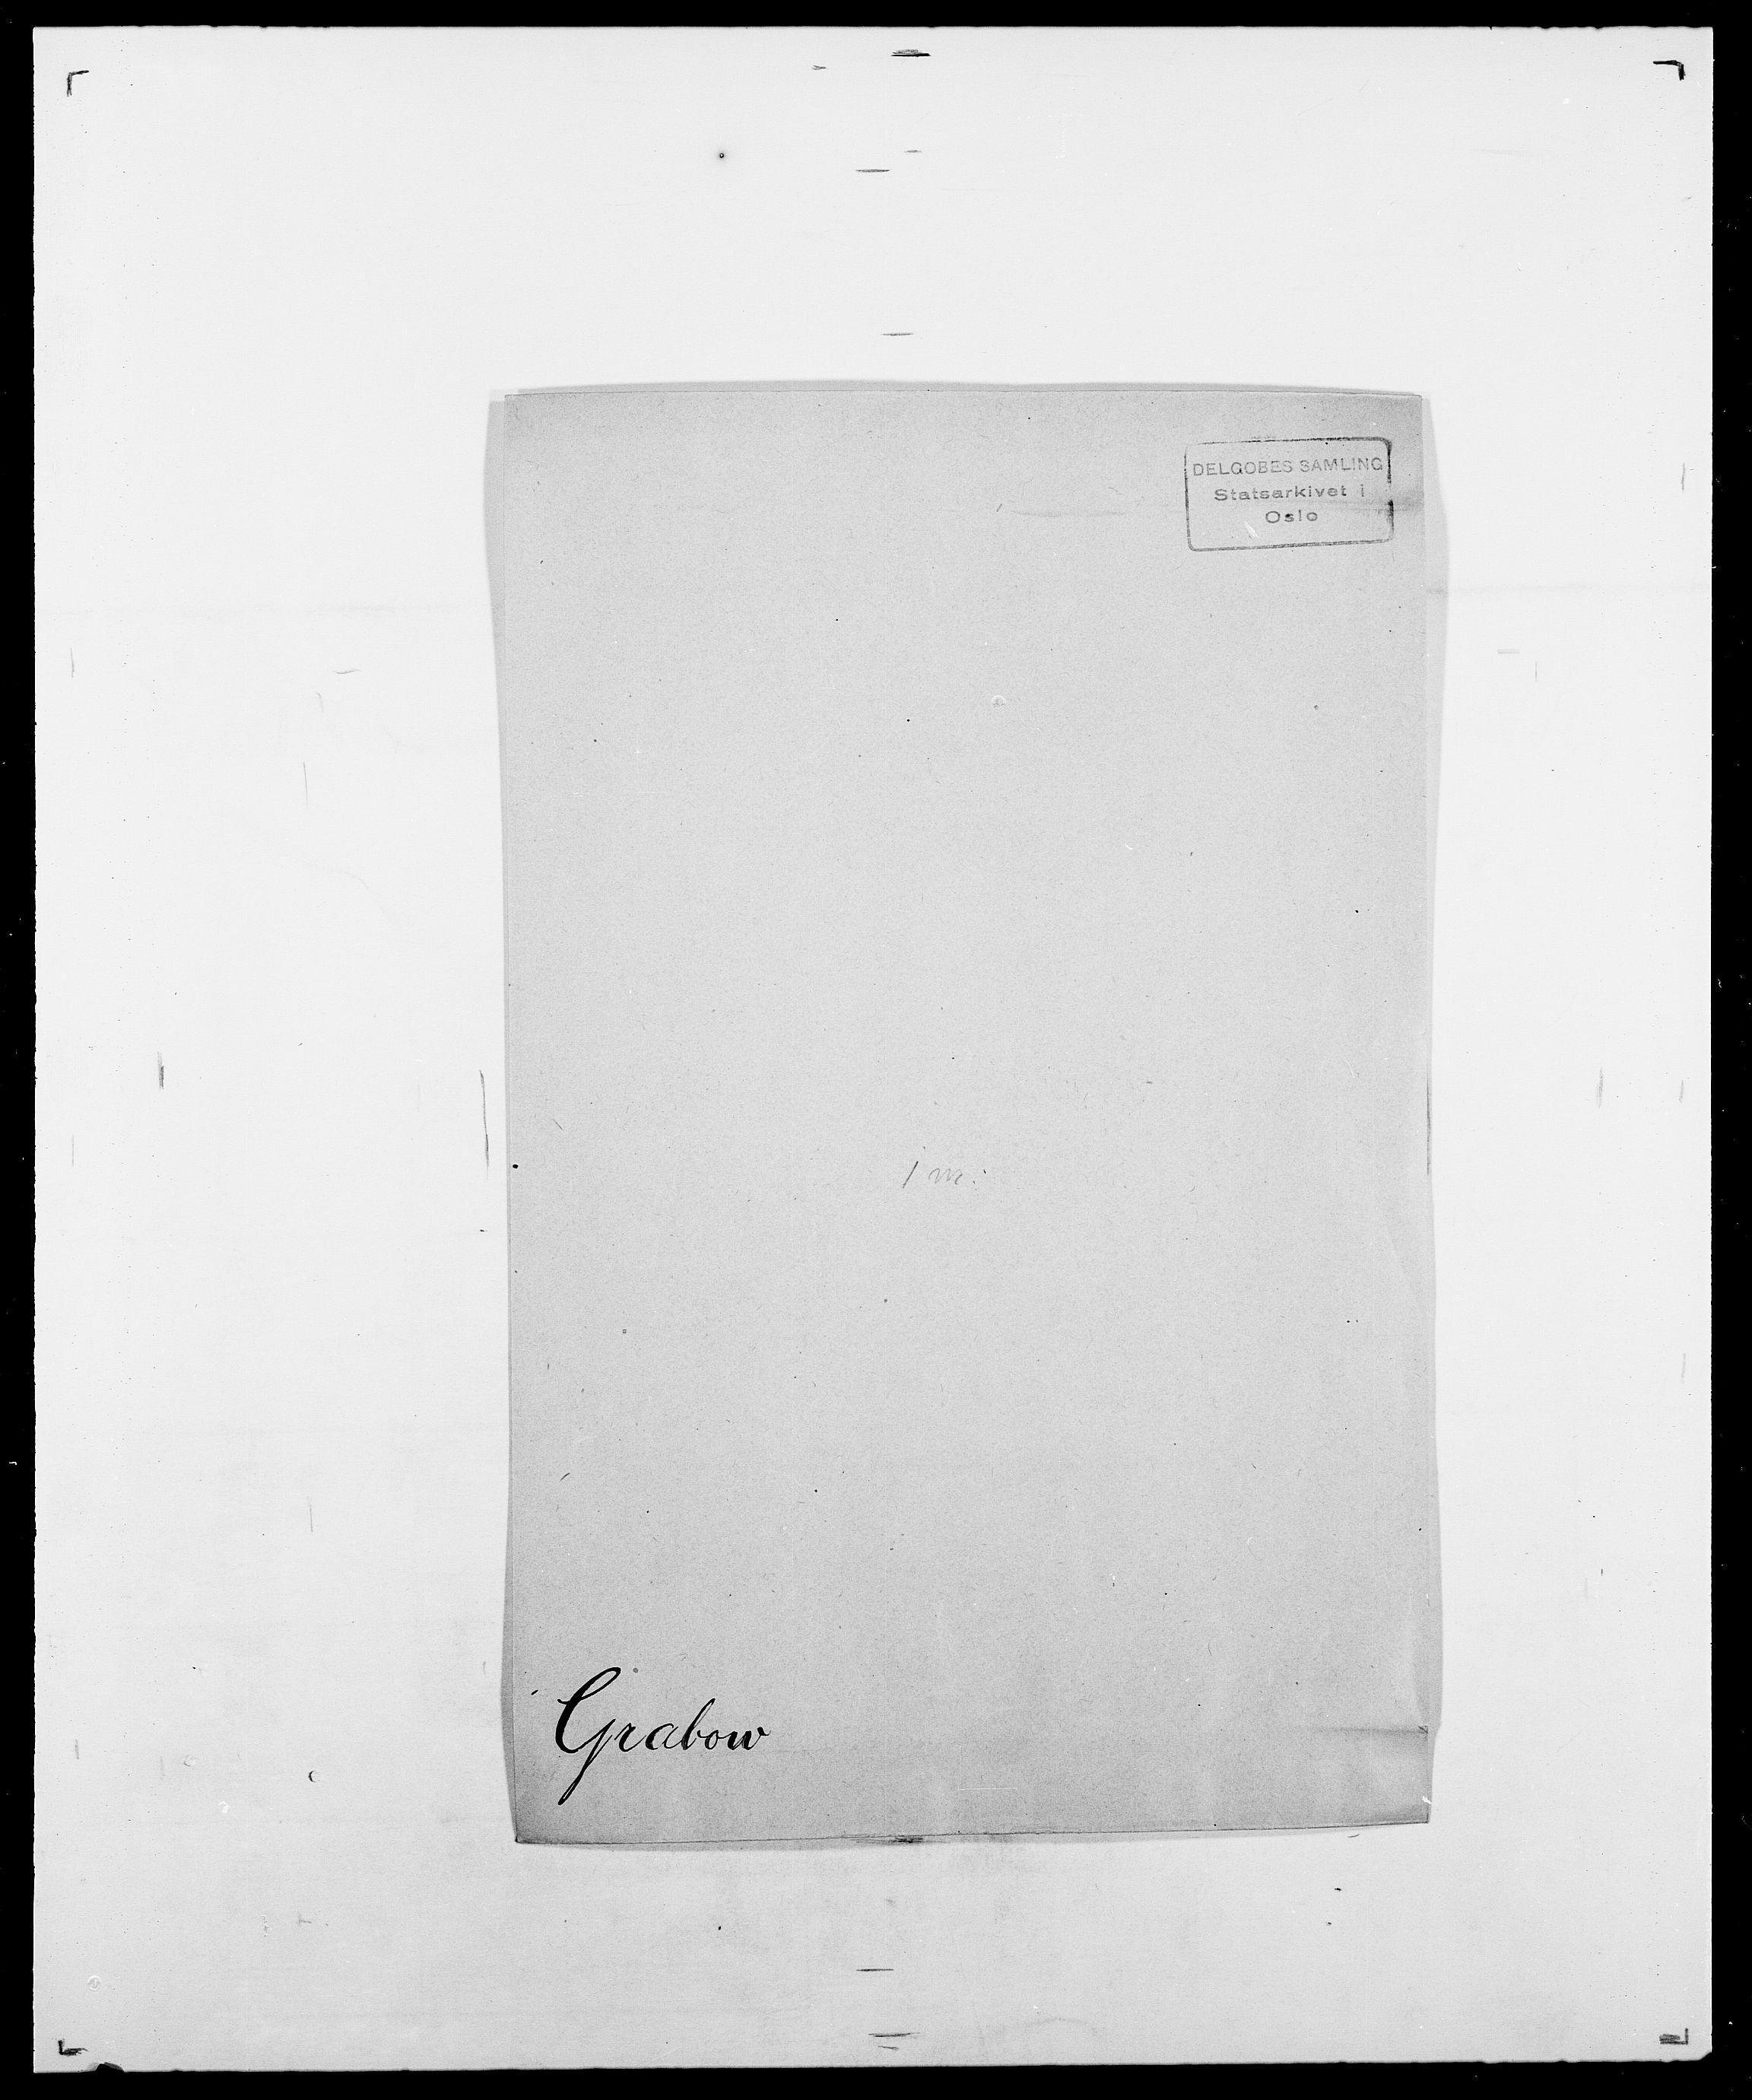 SAO, Delgobe, Charles Antoine - samling, D/Da/L0014: Giebdhausen - Grip, s. 452